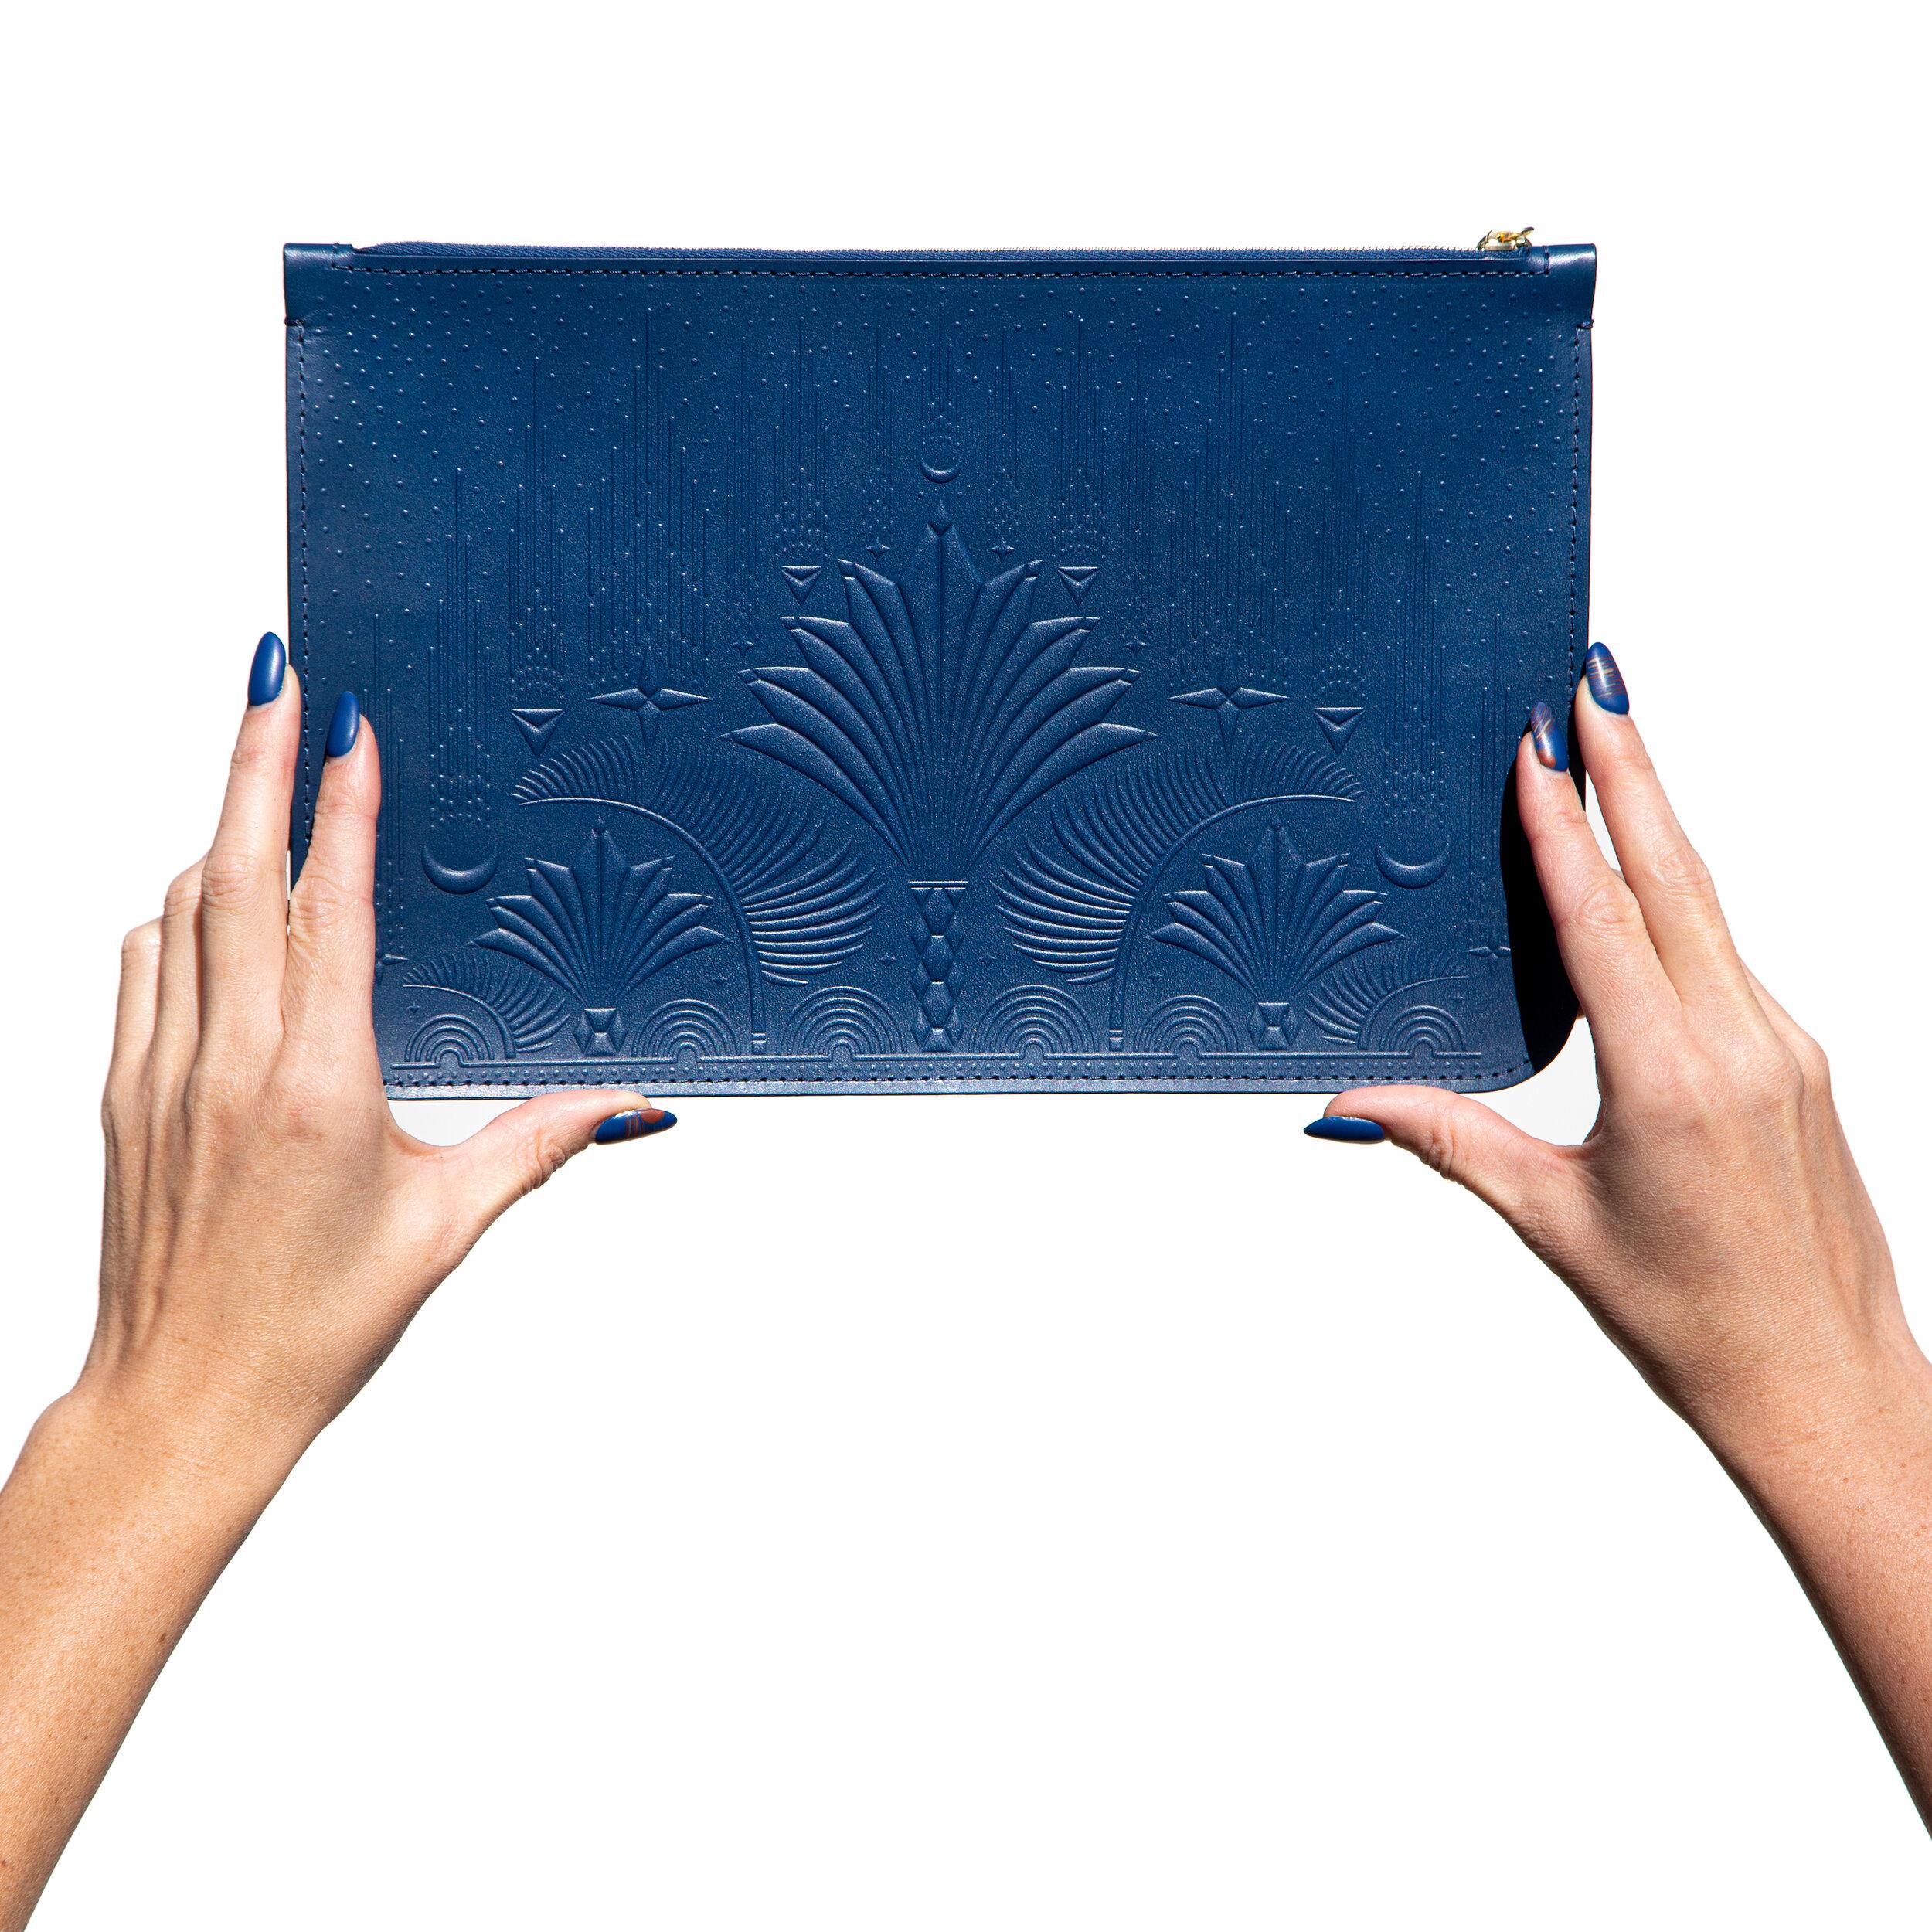 animal-handmade-blue-leather-clutch.jpg